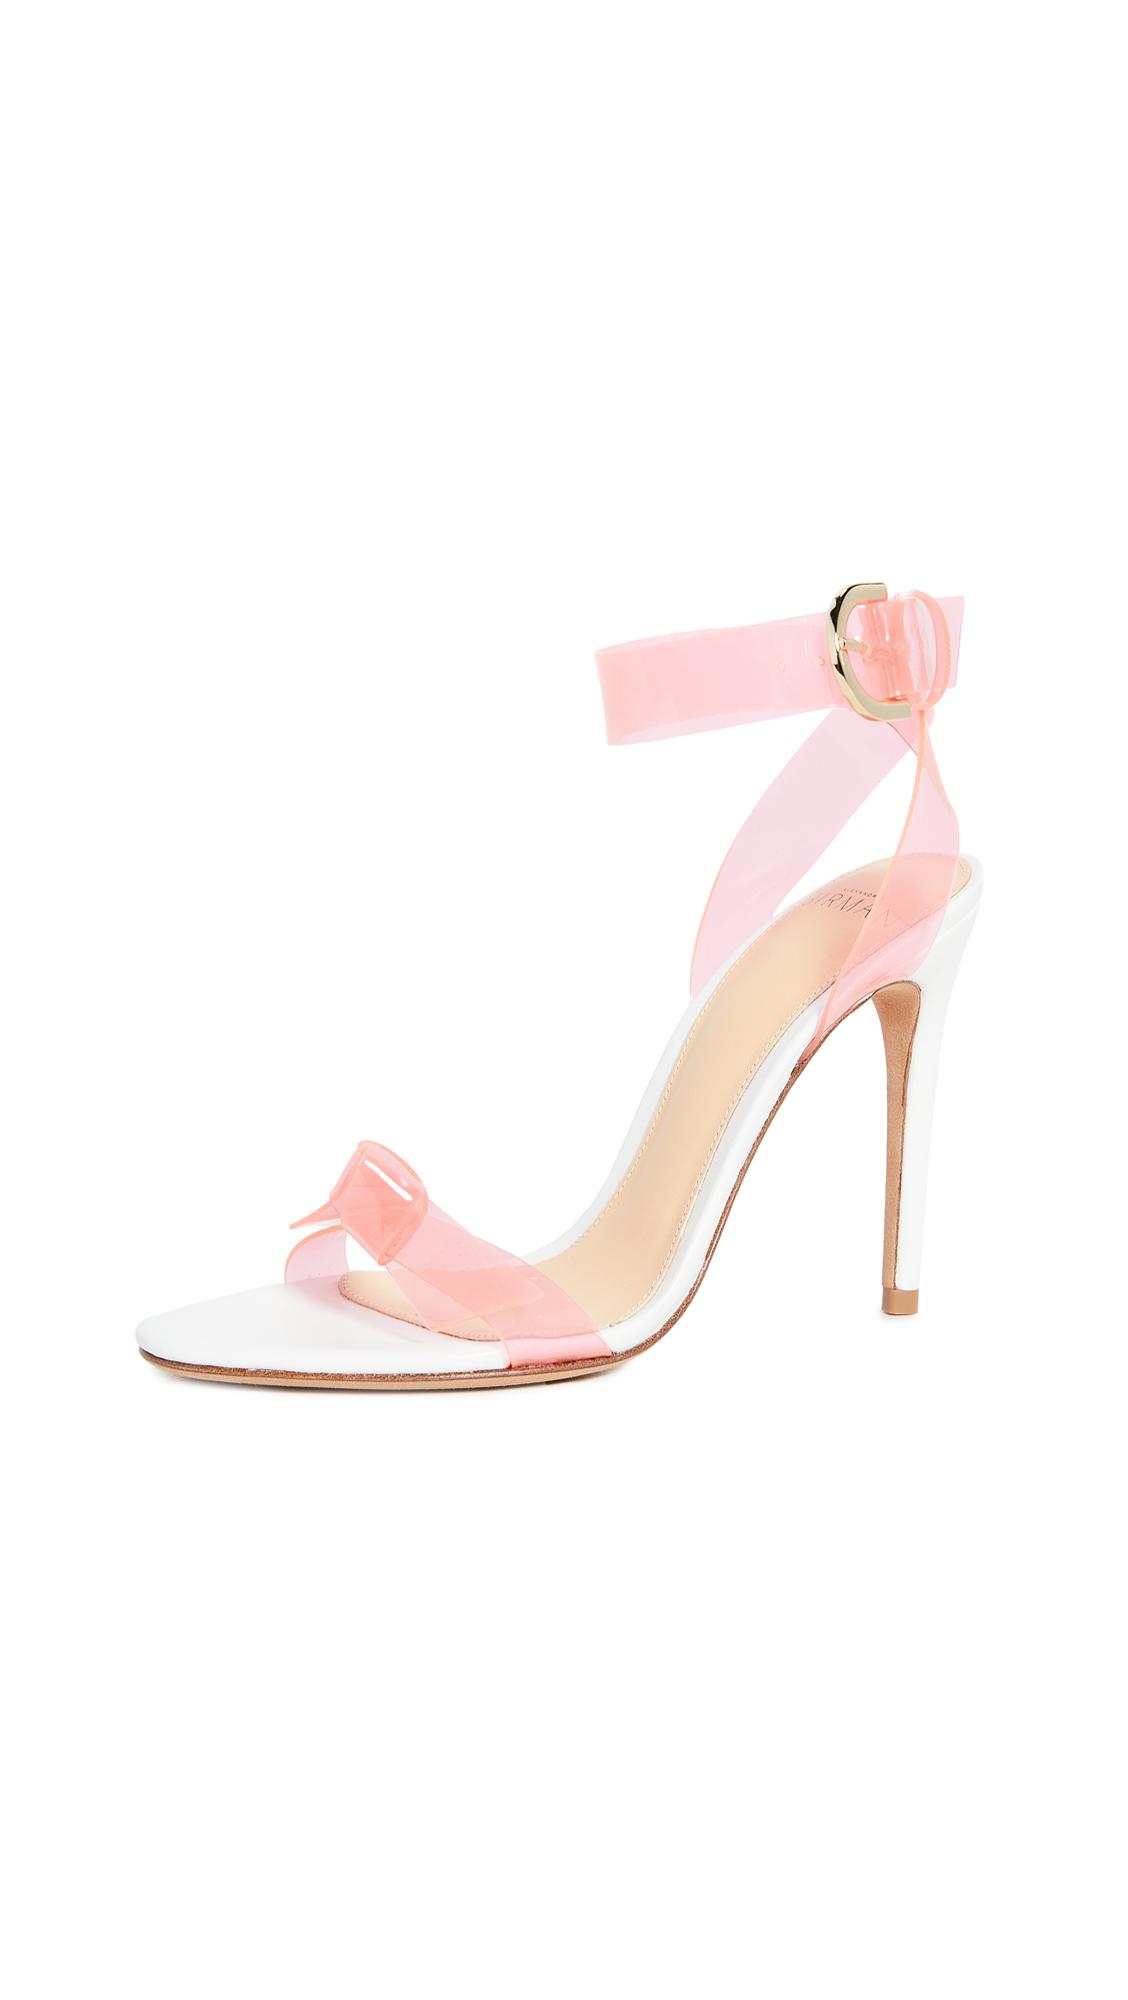 Alexandre Birman Clarita PVC Sandals 100mm - 60% Off Sale